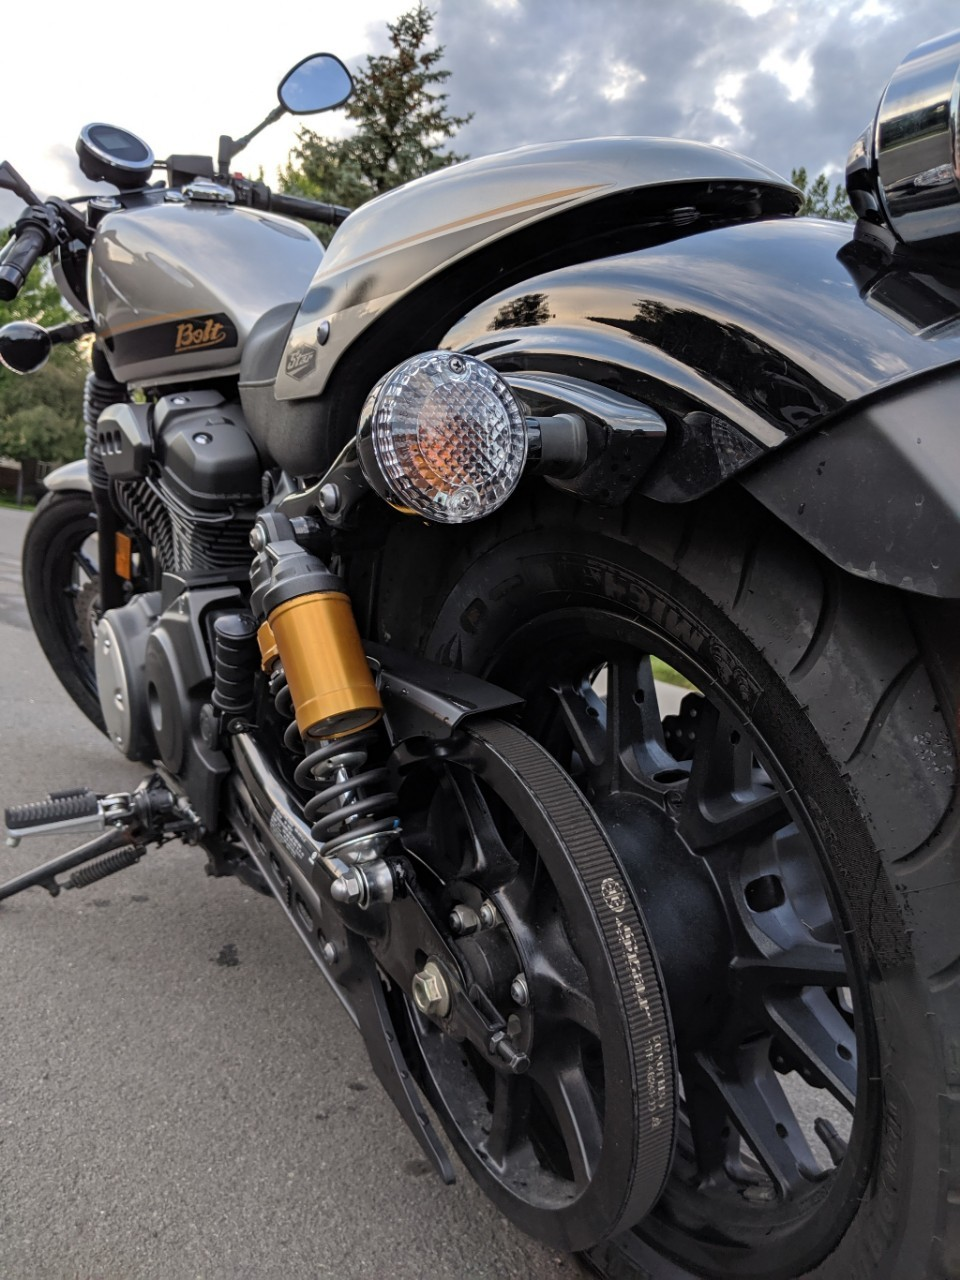 2015 Yamaha BOLT C-SPEC, Parker CO - - Cycletrader com